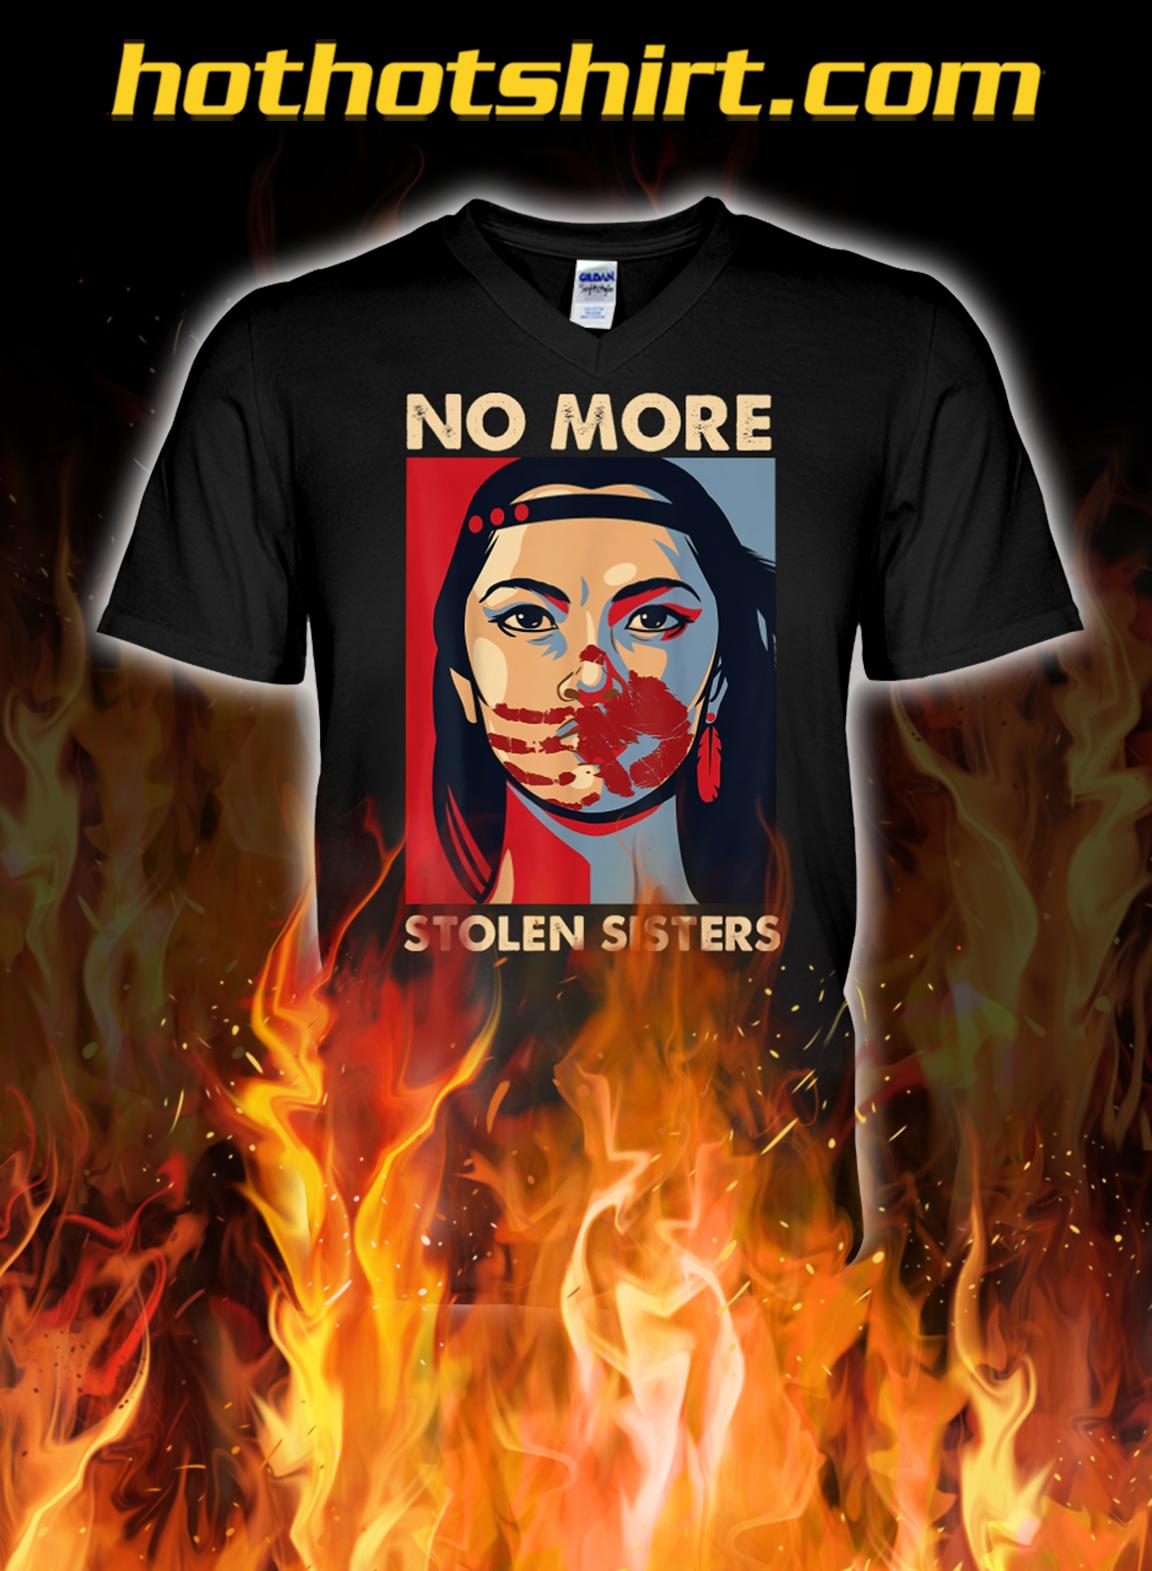 No more stolen sisters v-neck